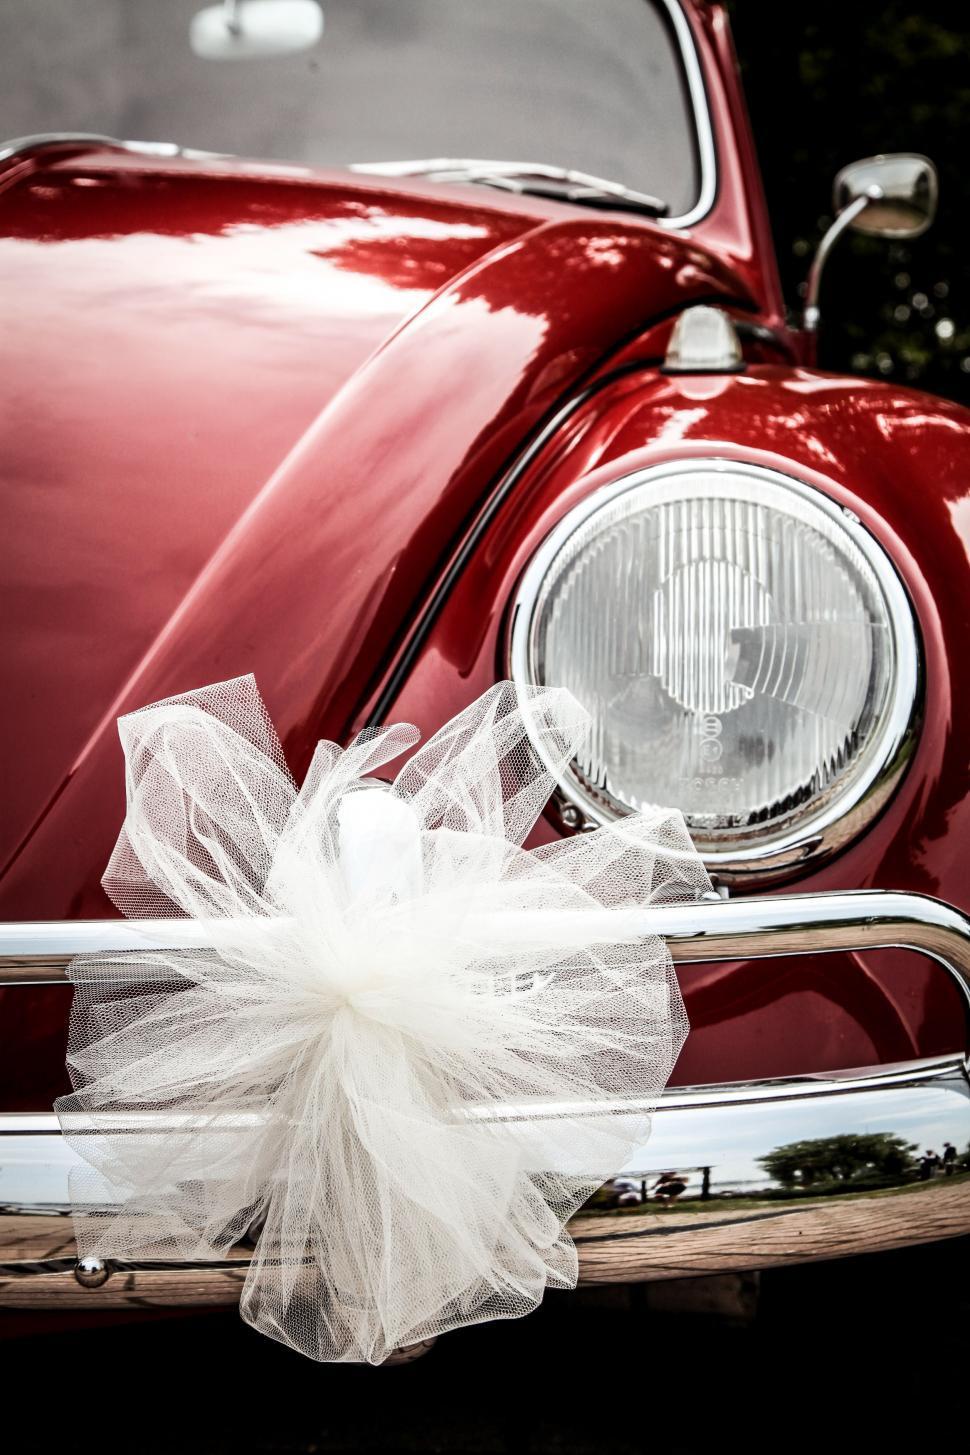 Download Free Stock Photo of Vintage wedding car